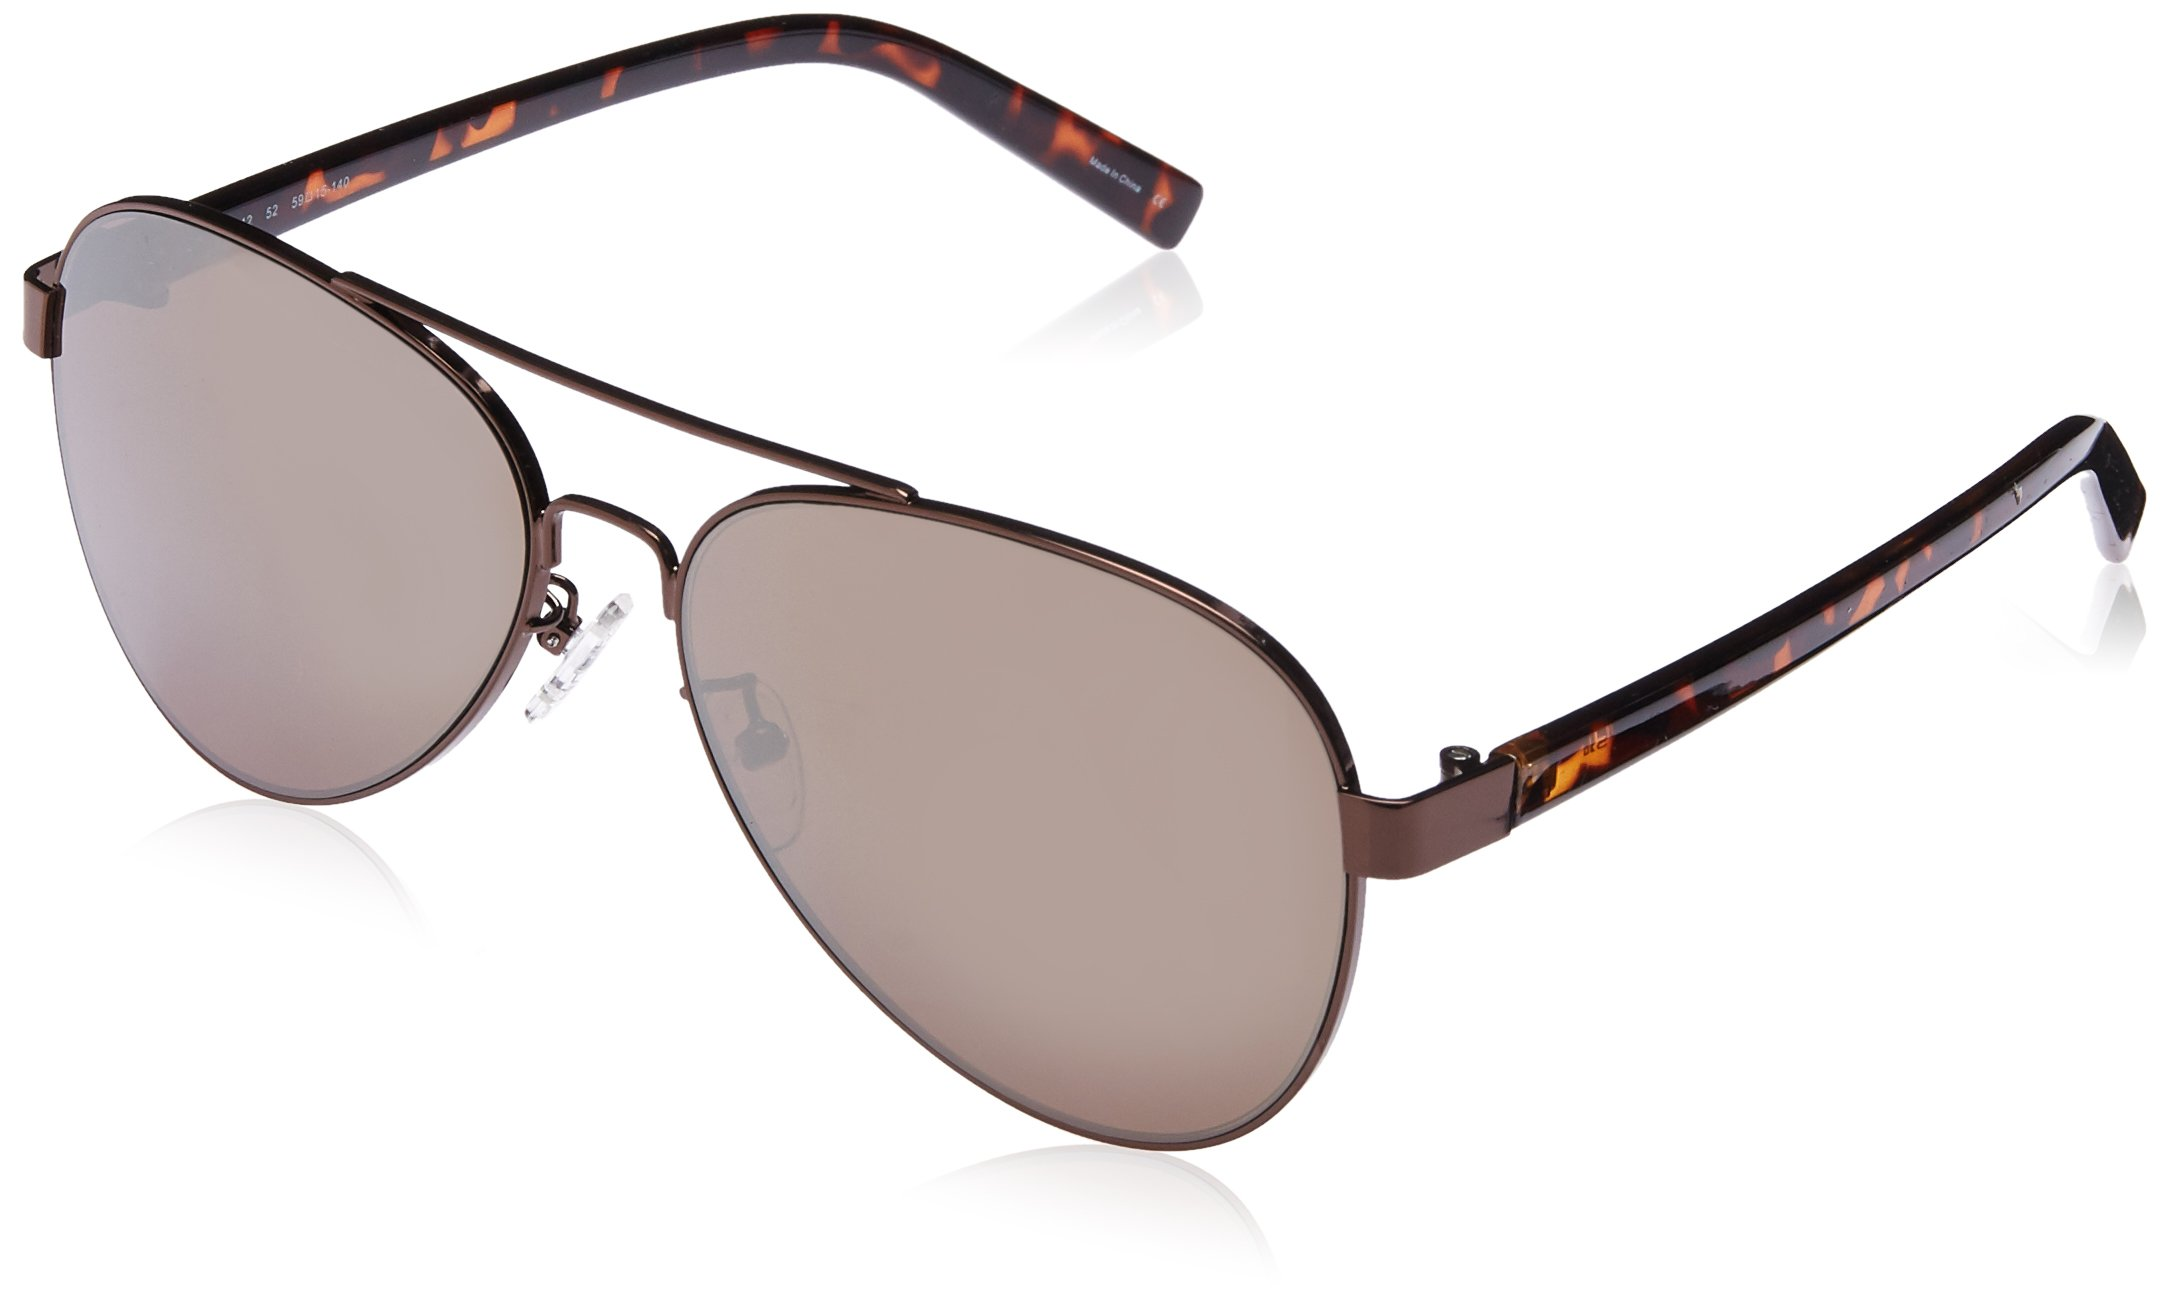 Joe's Jeans Women's JJ 1012 Aviator Fashion Designer UV Protection Sunglasses, Bronze Frame, 140 mm